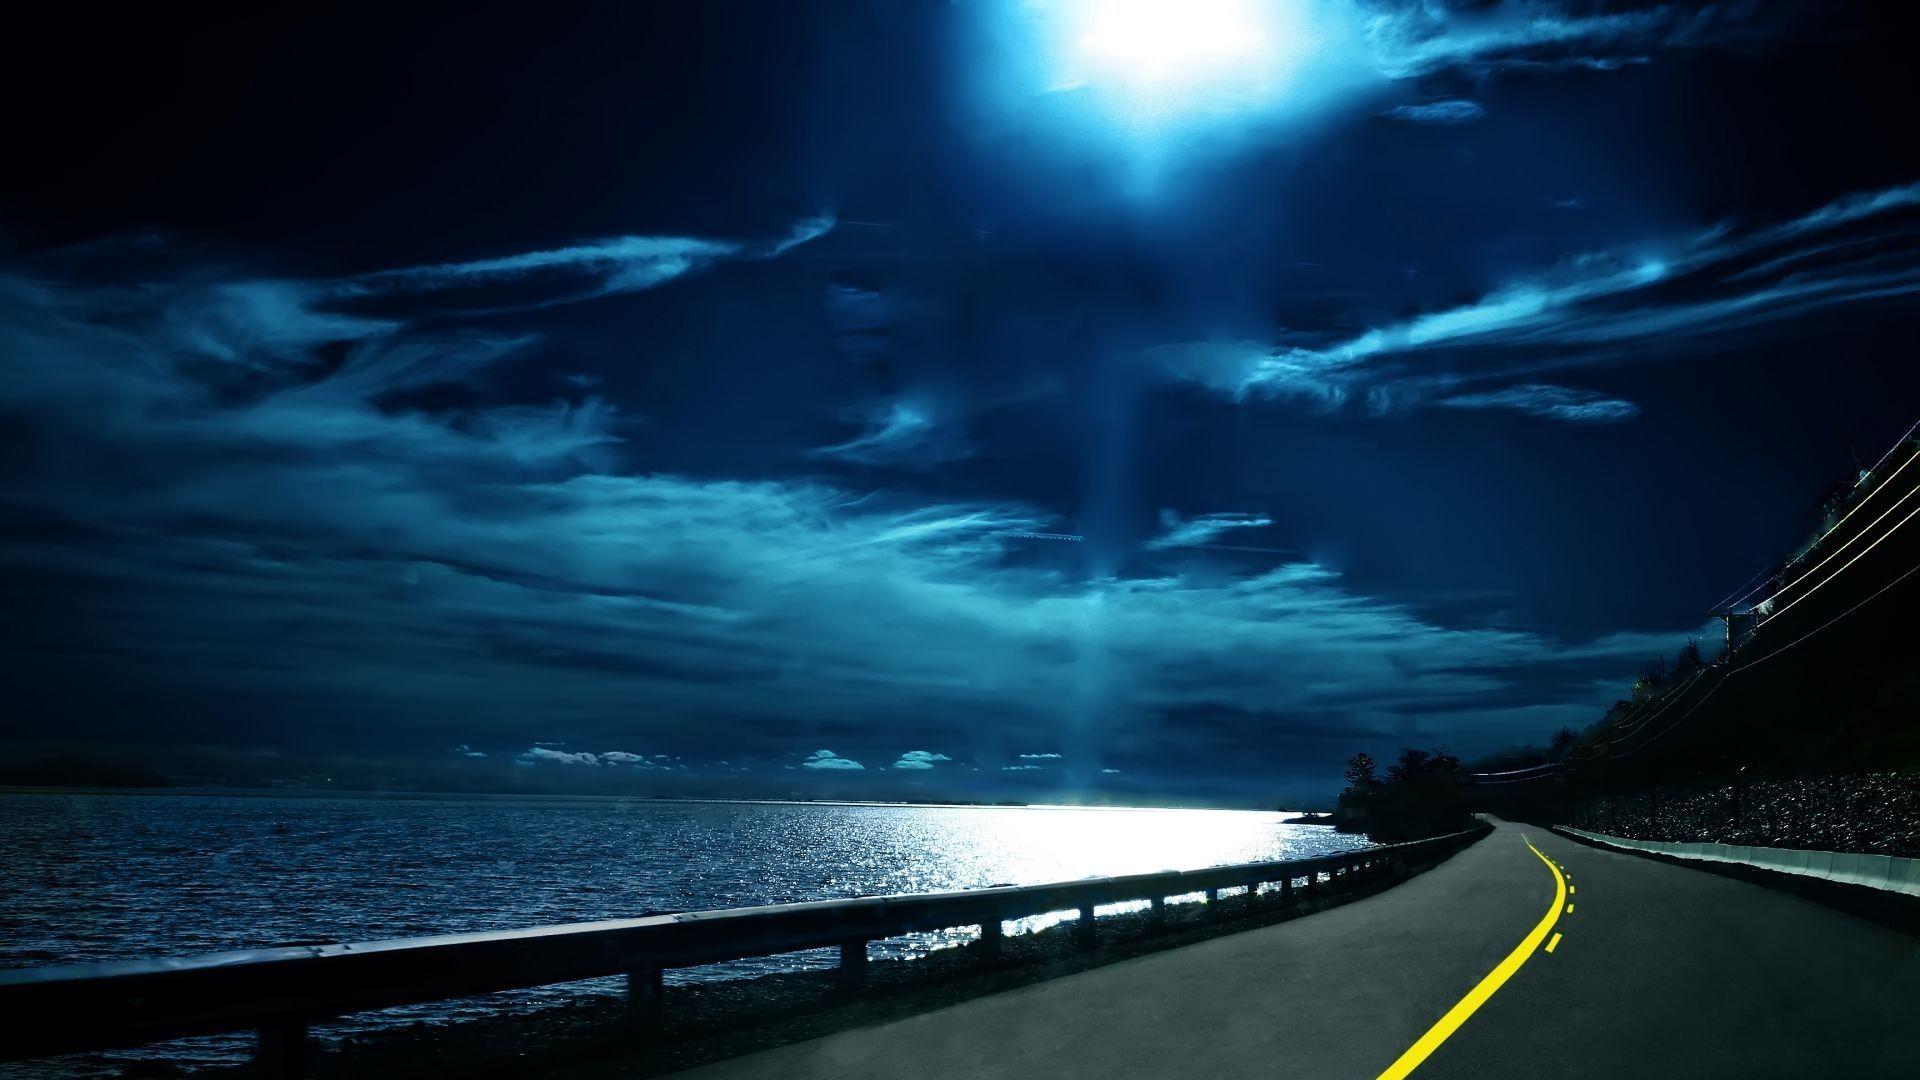 cool sea moon night time full screen hd wallpaper. | 3d | pinterest